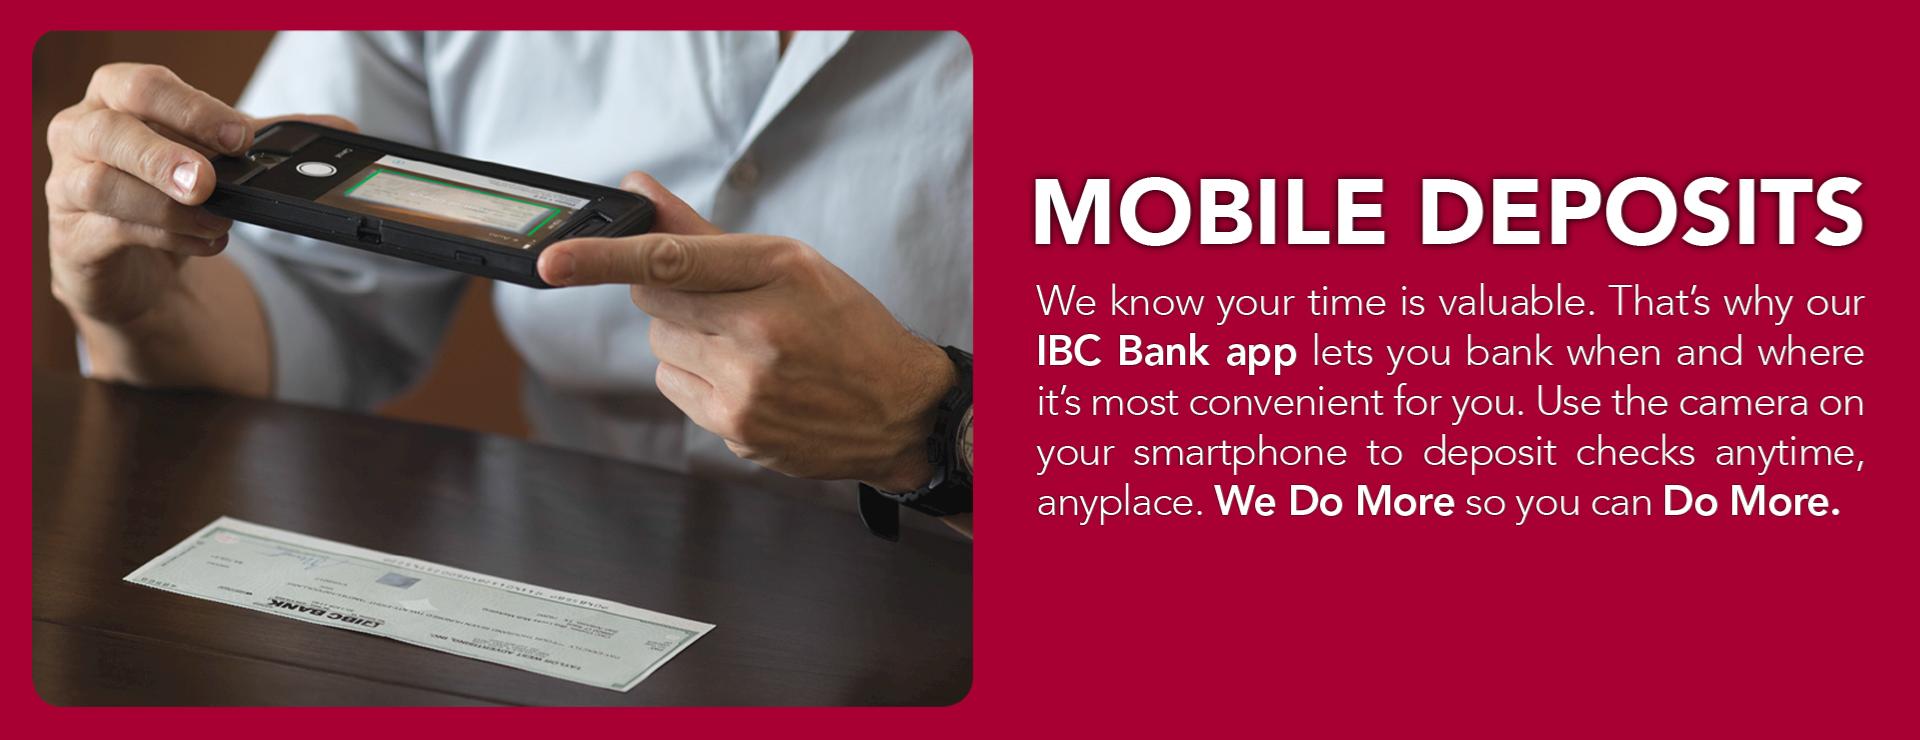 04.2019 - Mobile Deposits